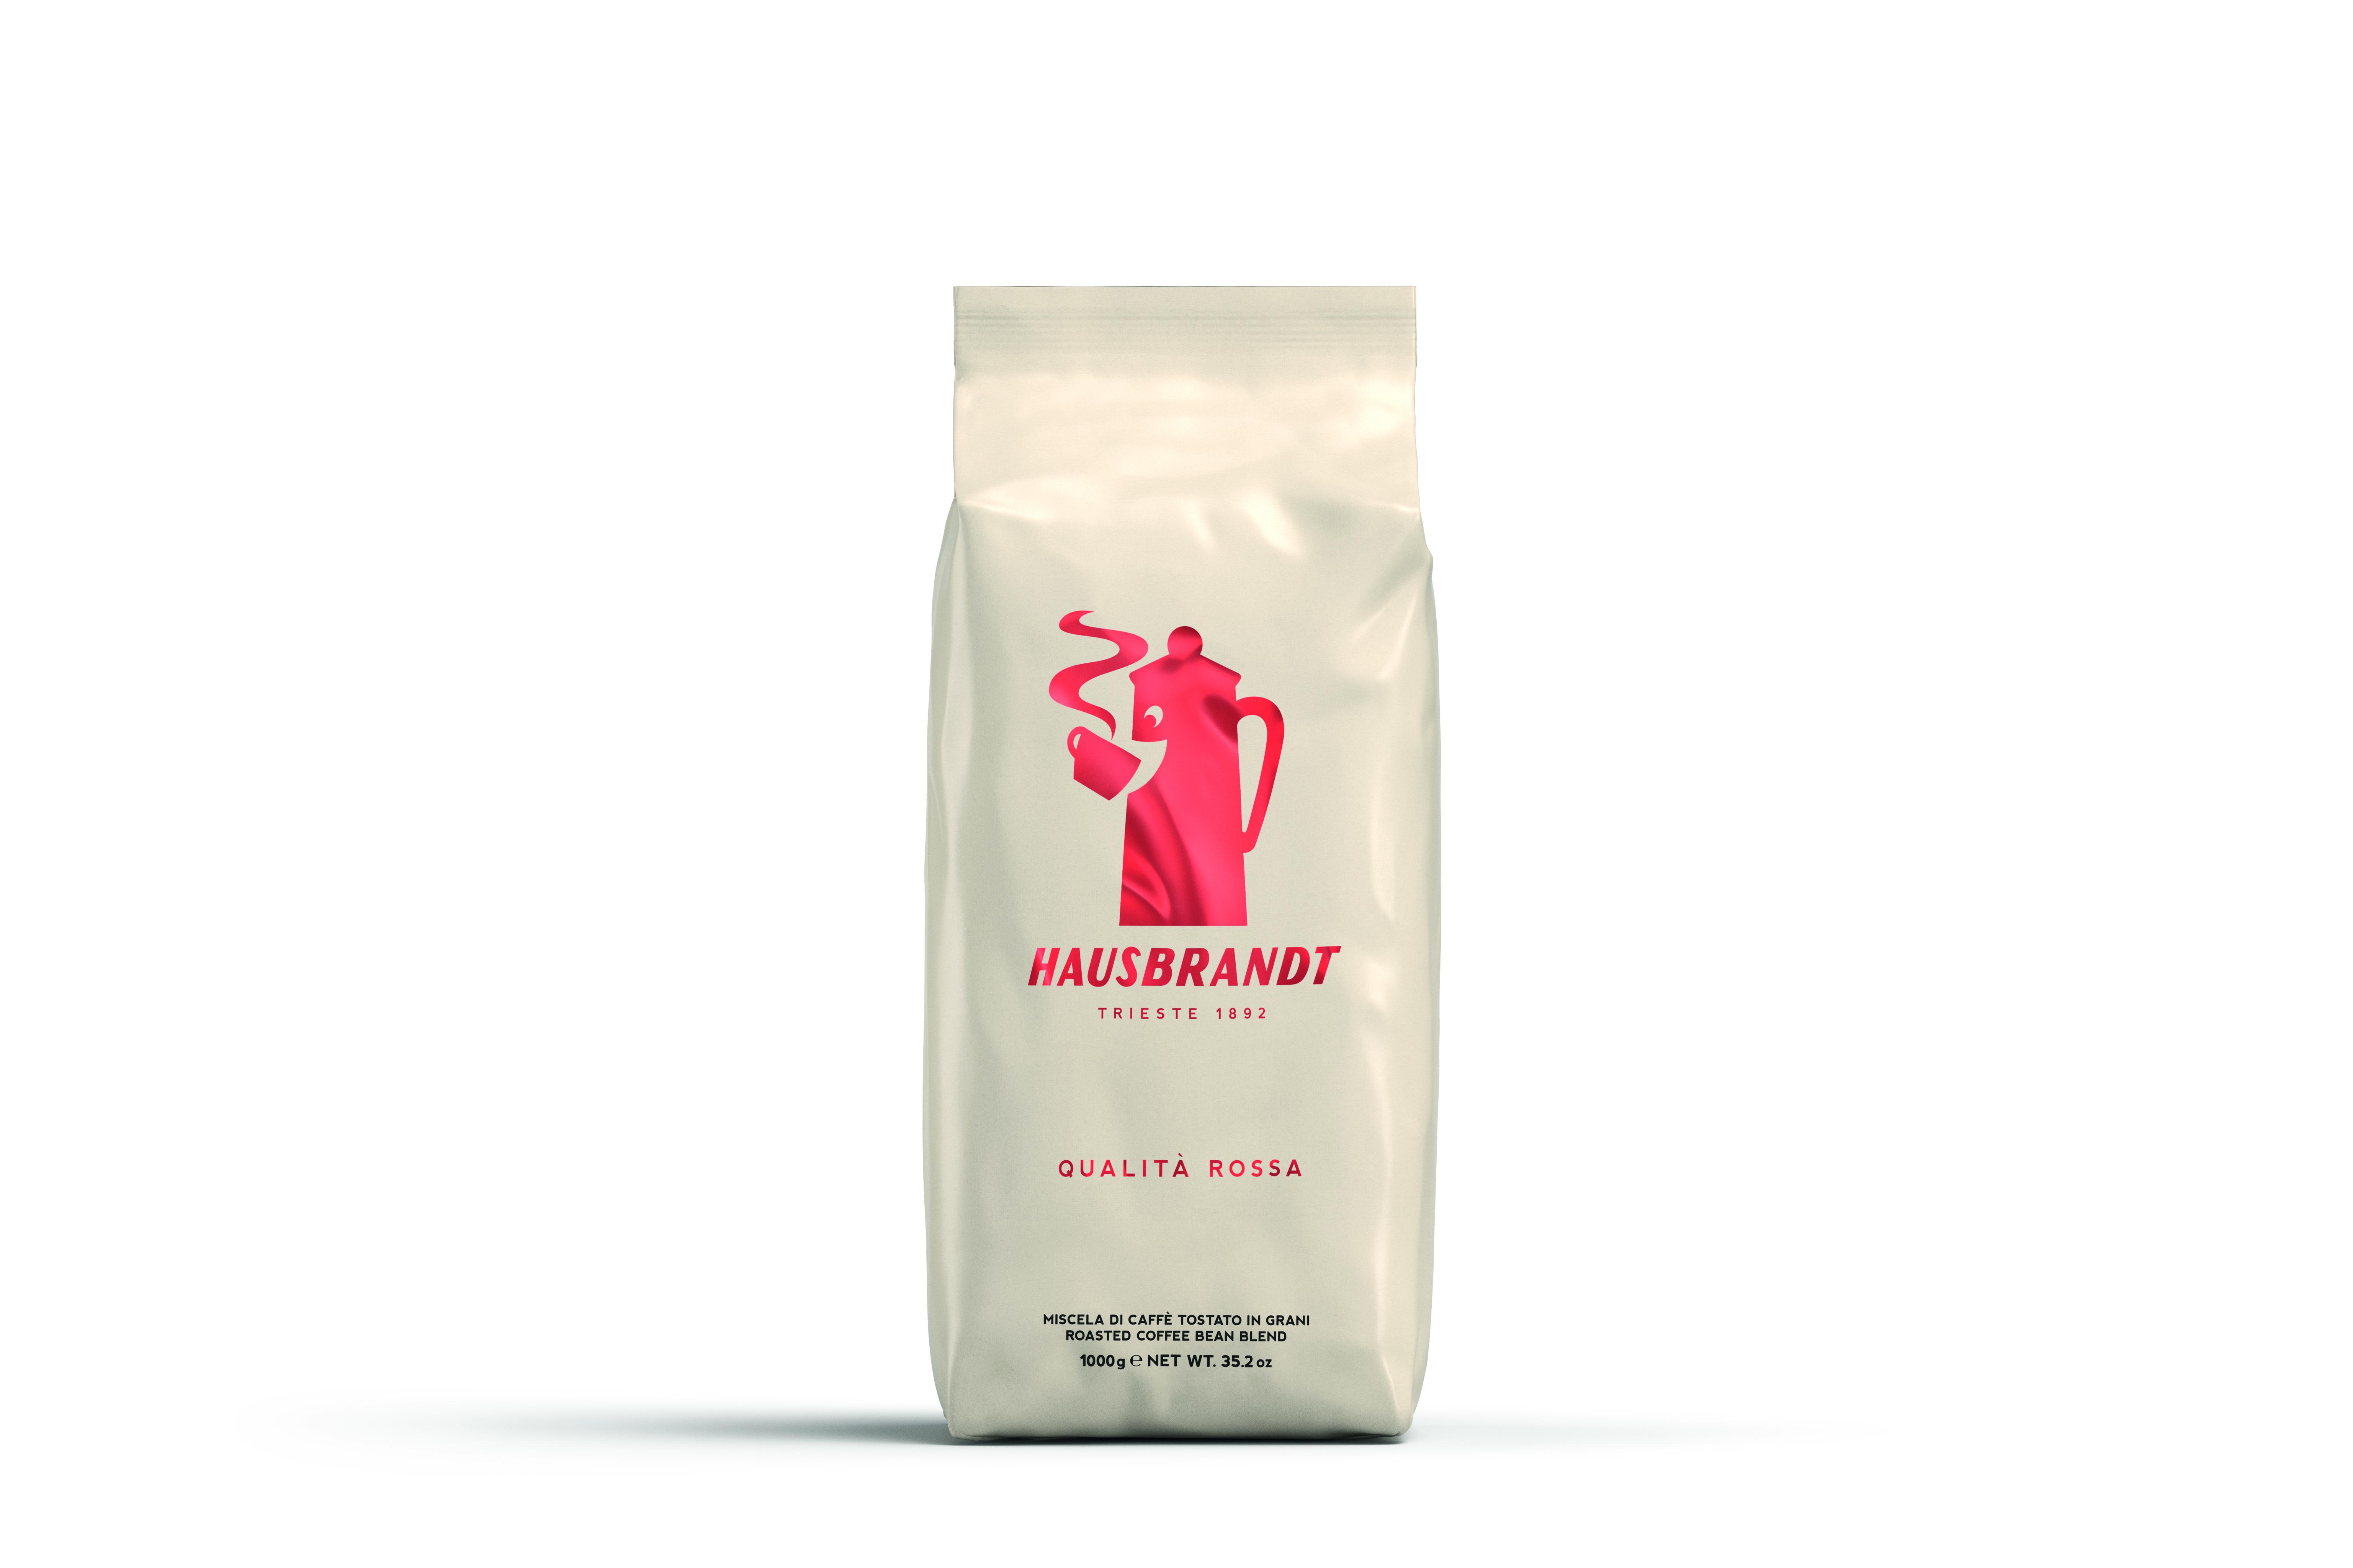 HAUSBRANDT Caffé Rossa 6 X 1 KG Bohnen im Beutel